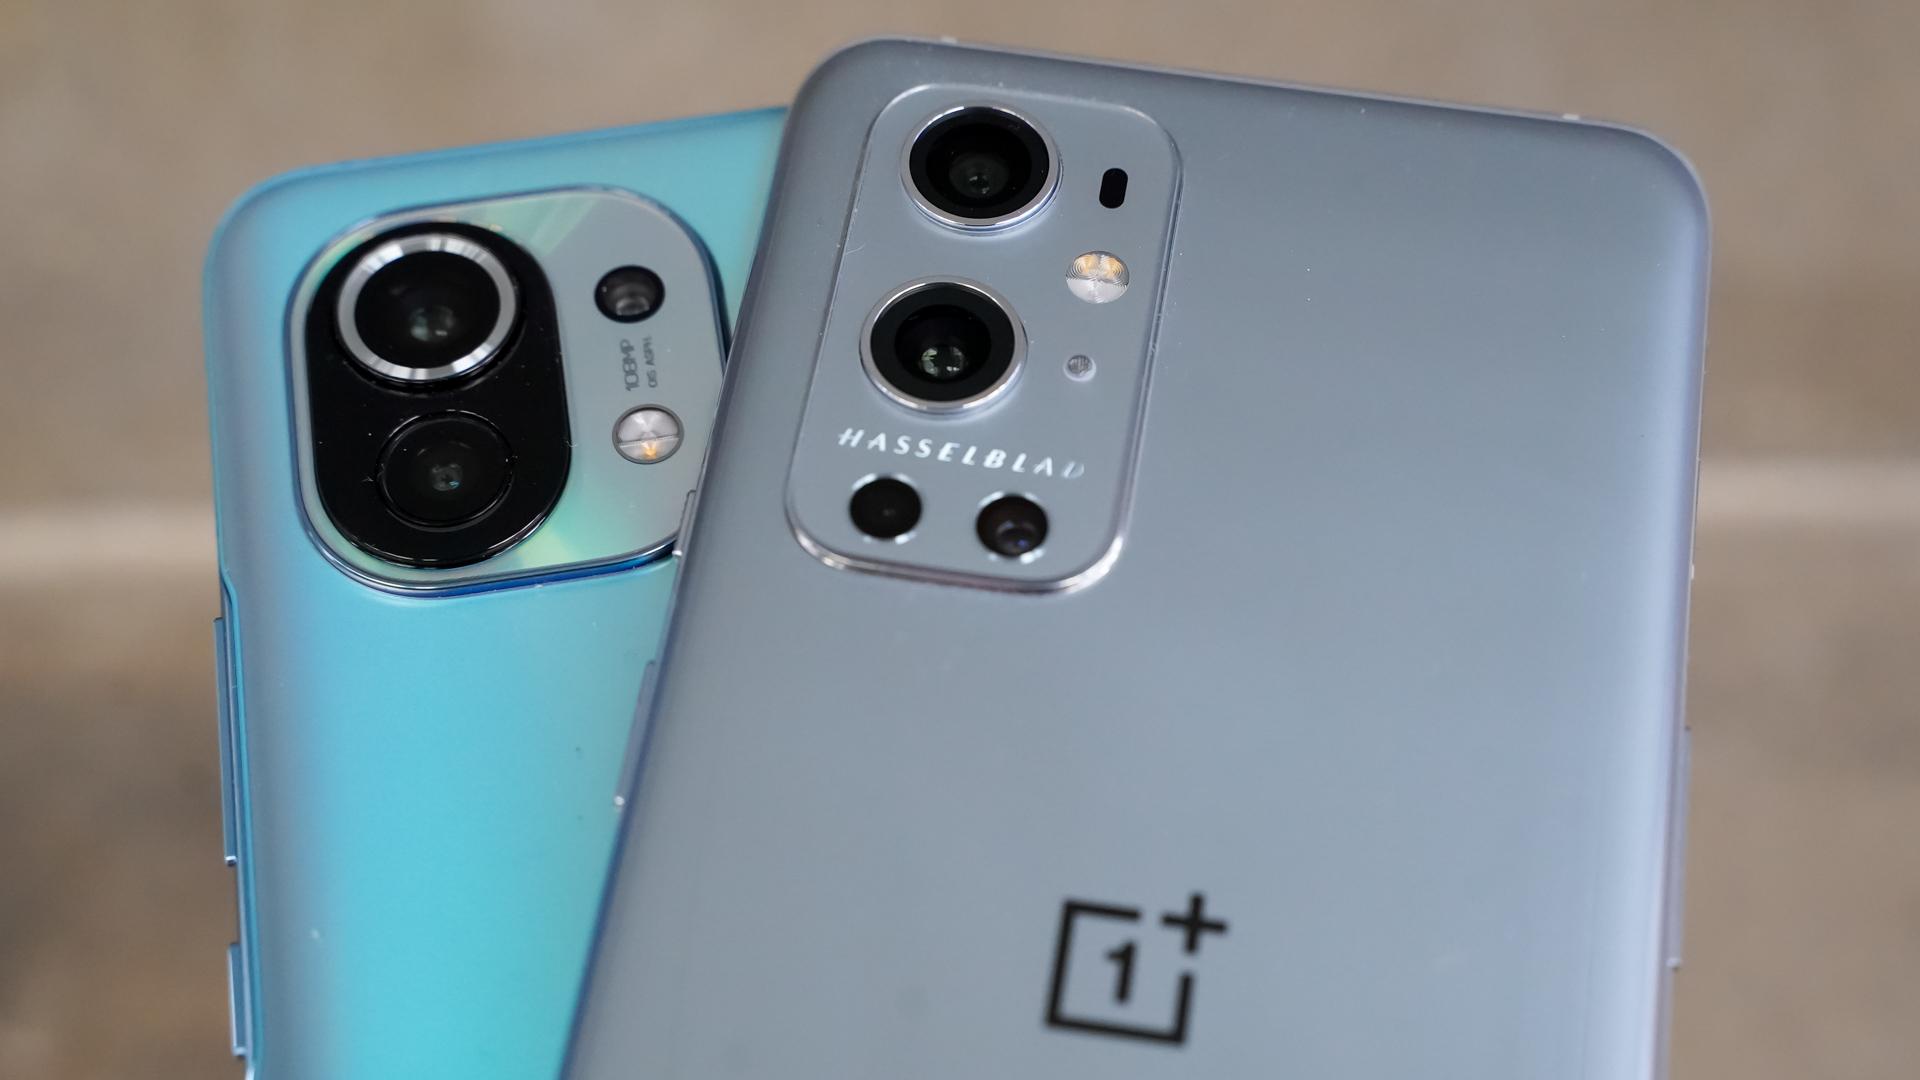 OnePlus 9 Pro vs Xiaomi Mi 11 silver pro